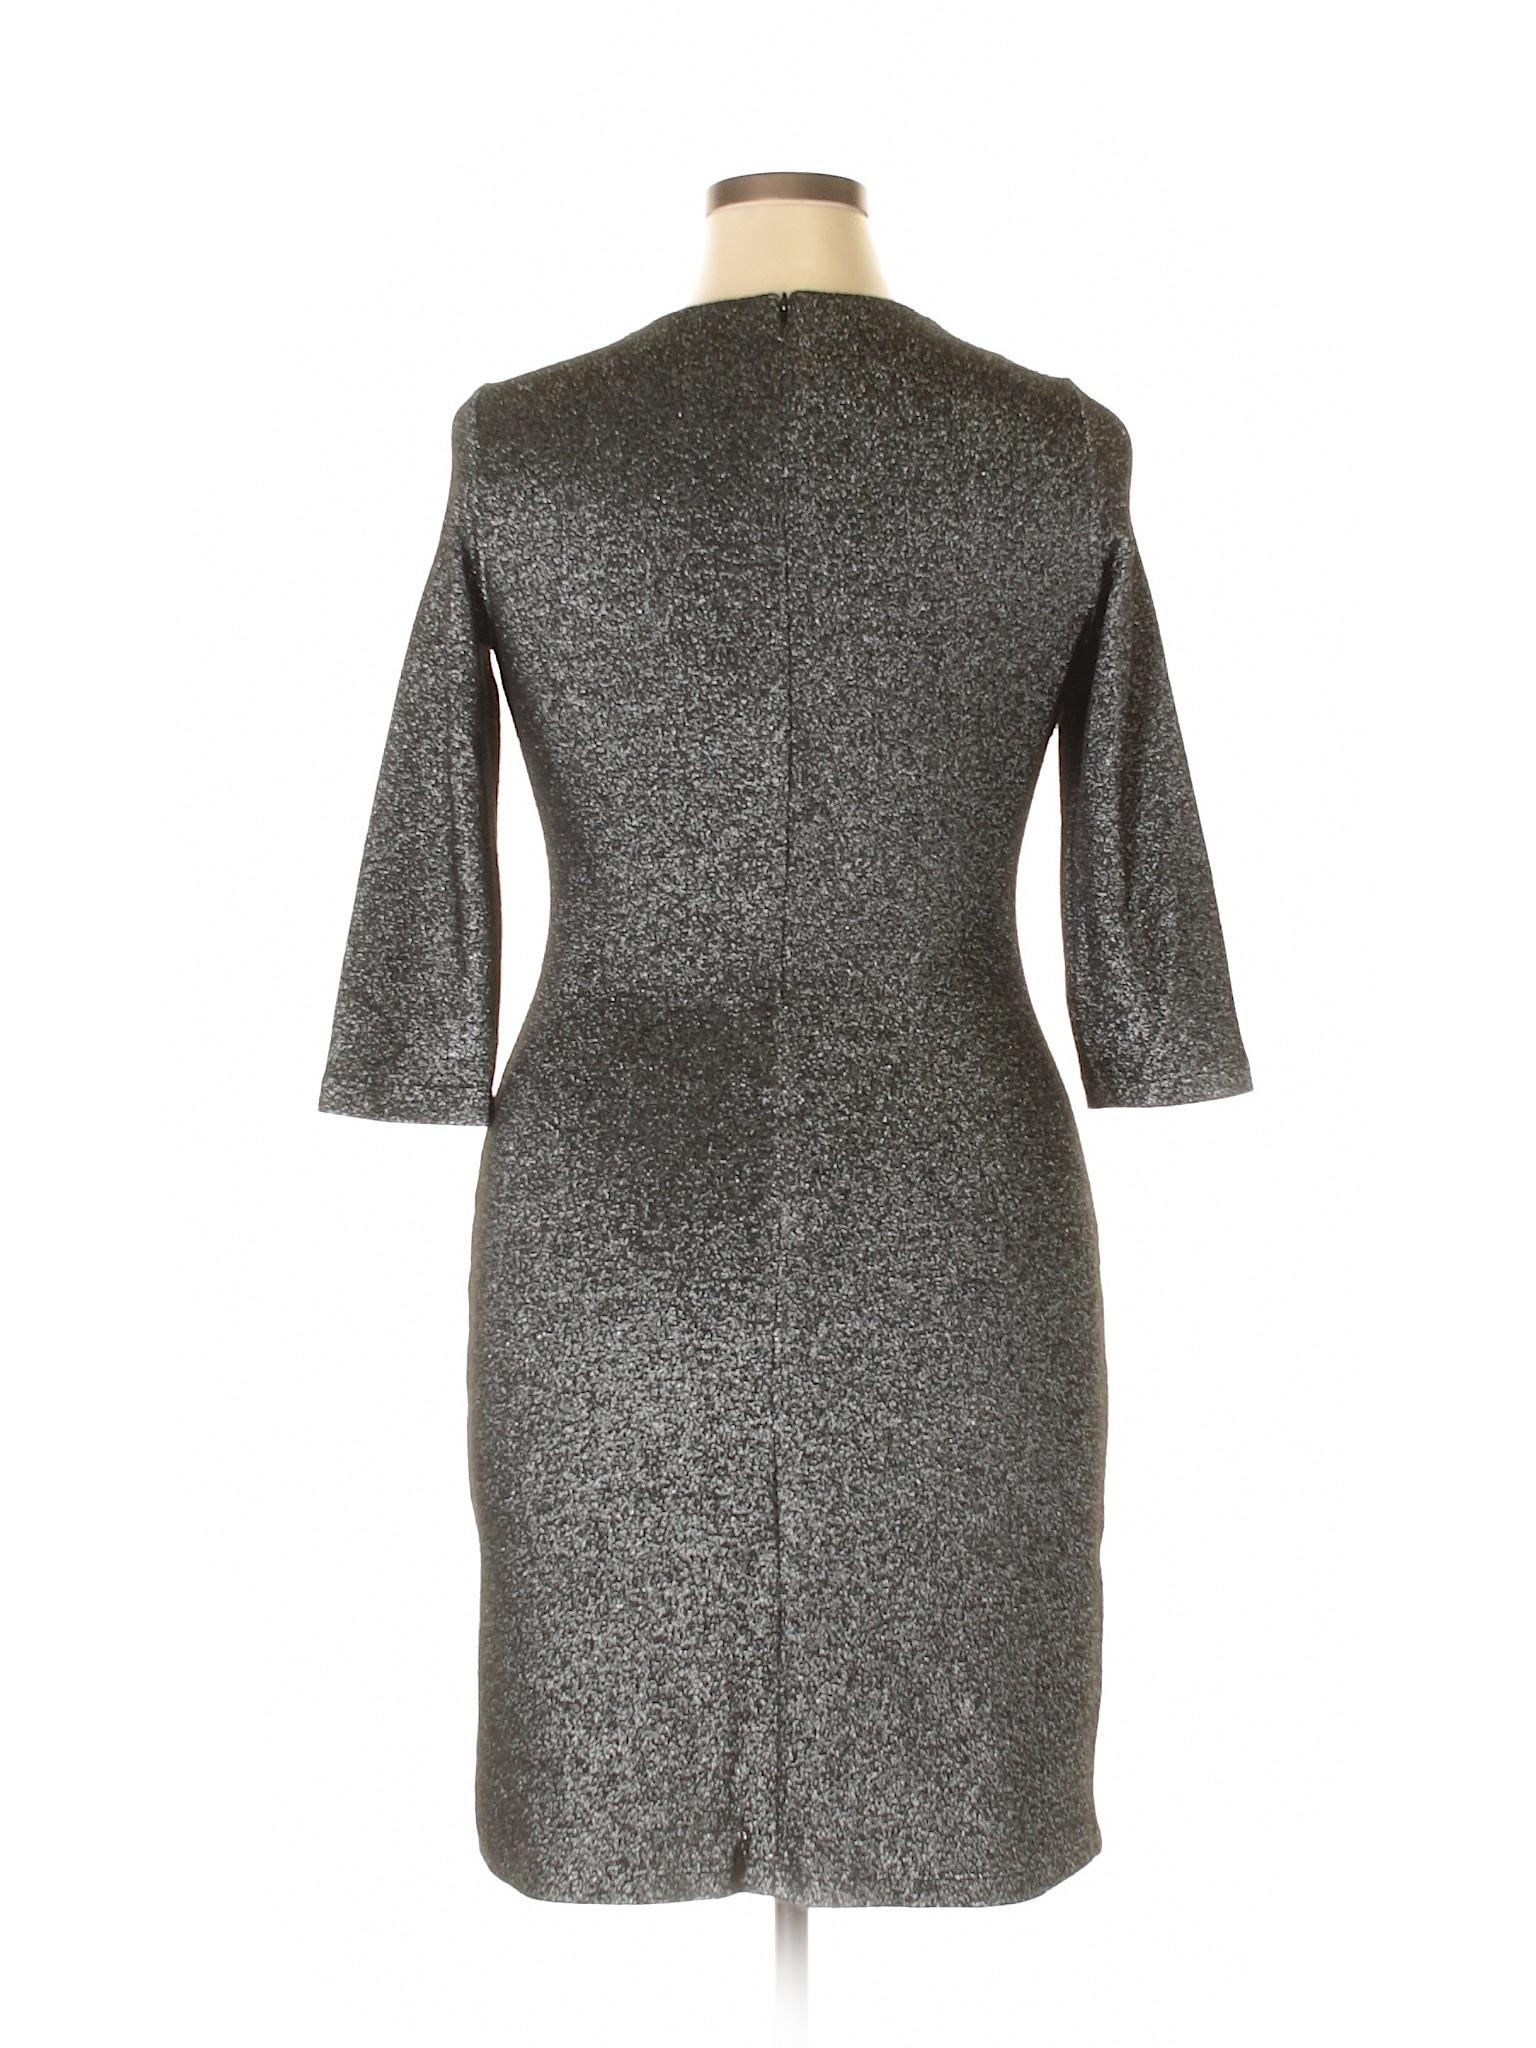 Boutique Kane winter Casual Karen Dress rXSr41A